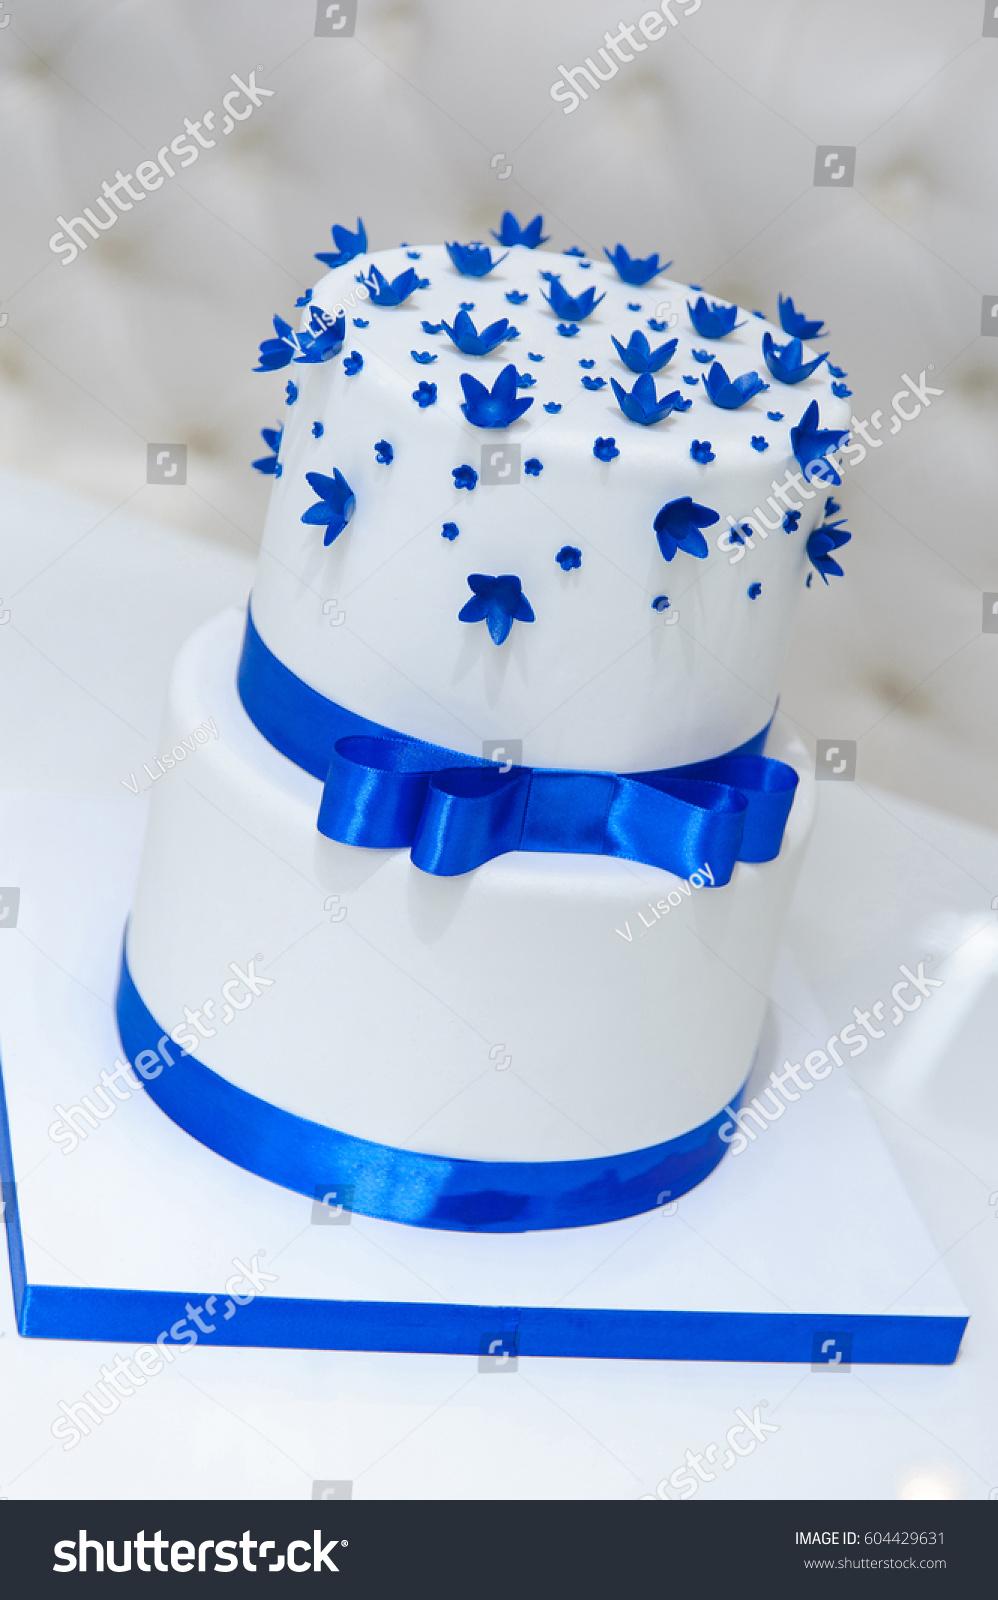 White wedding cake blue flowers bow stock photo edit now 604429631 white wedding cake with blue flowers and a bow izmirmasajfo